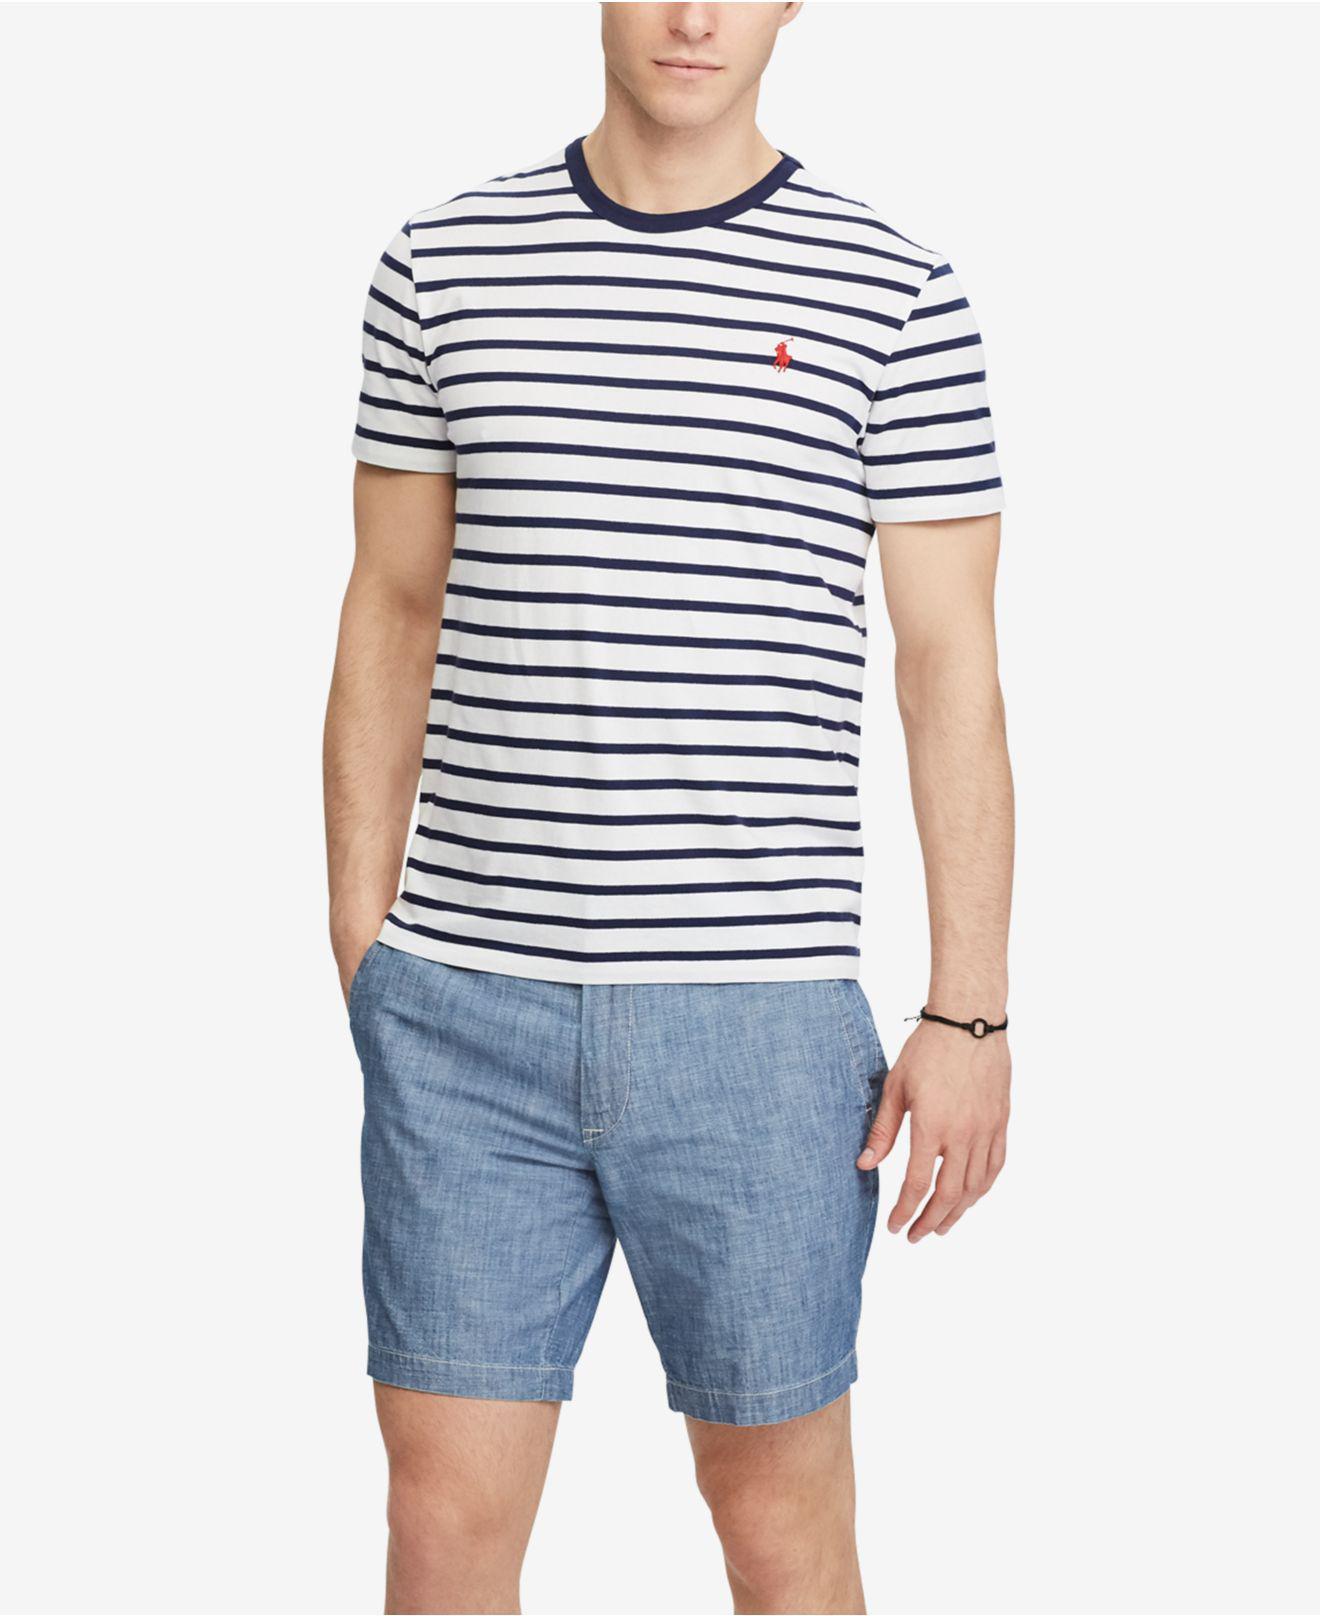 7c2182caa Polo Ralph Lauren Men's Custom Slim Fit Striped Cotton T-shirt in ...